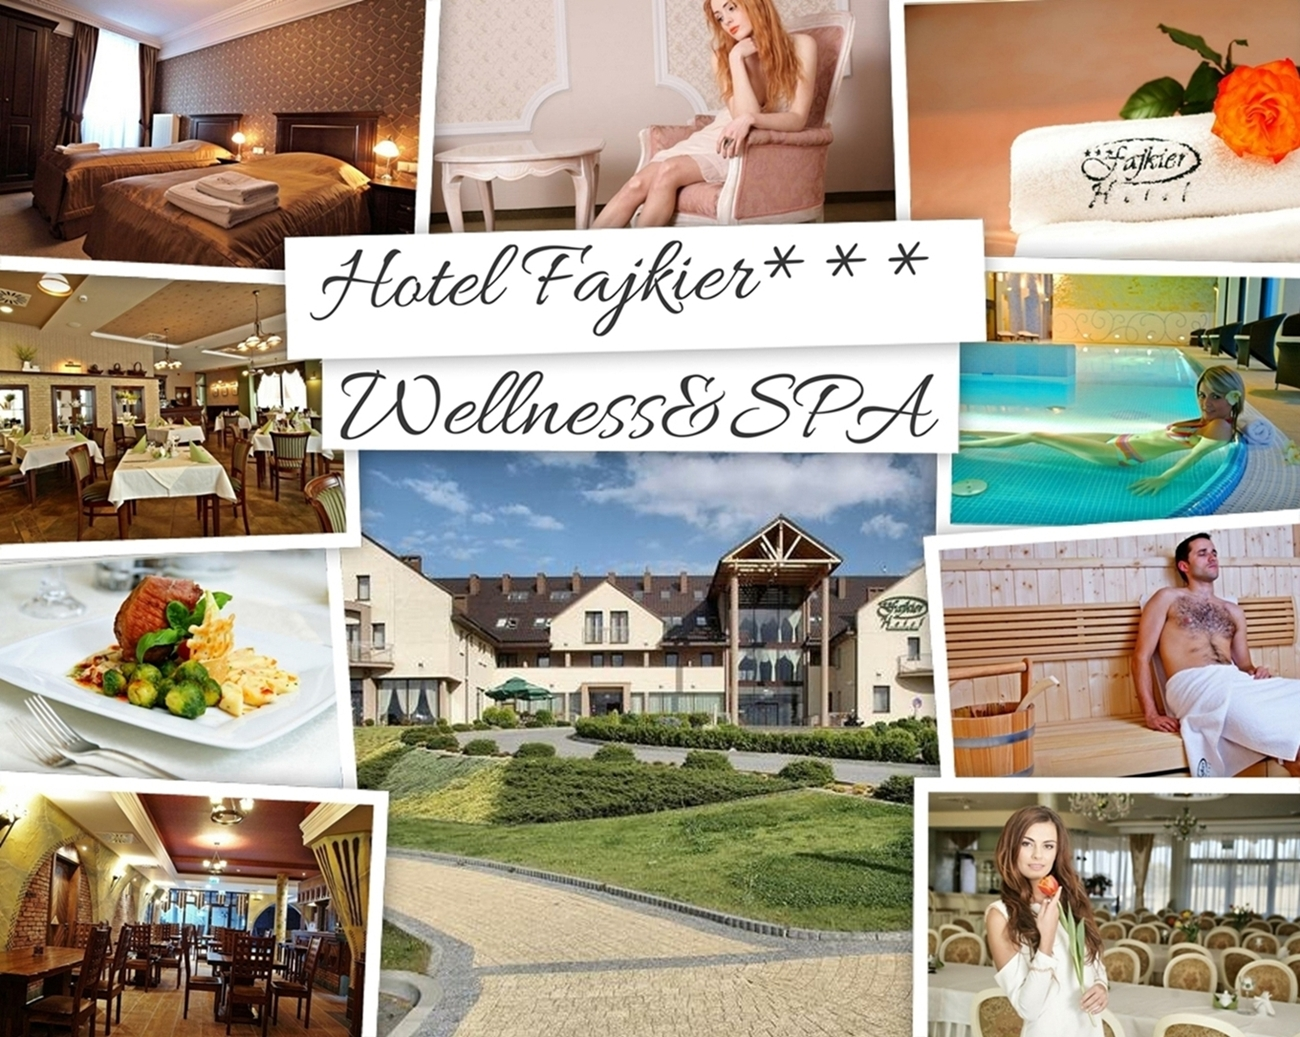 Hotel Fajkier***Wellness&Spa